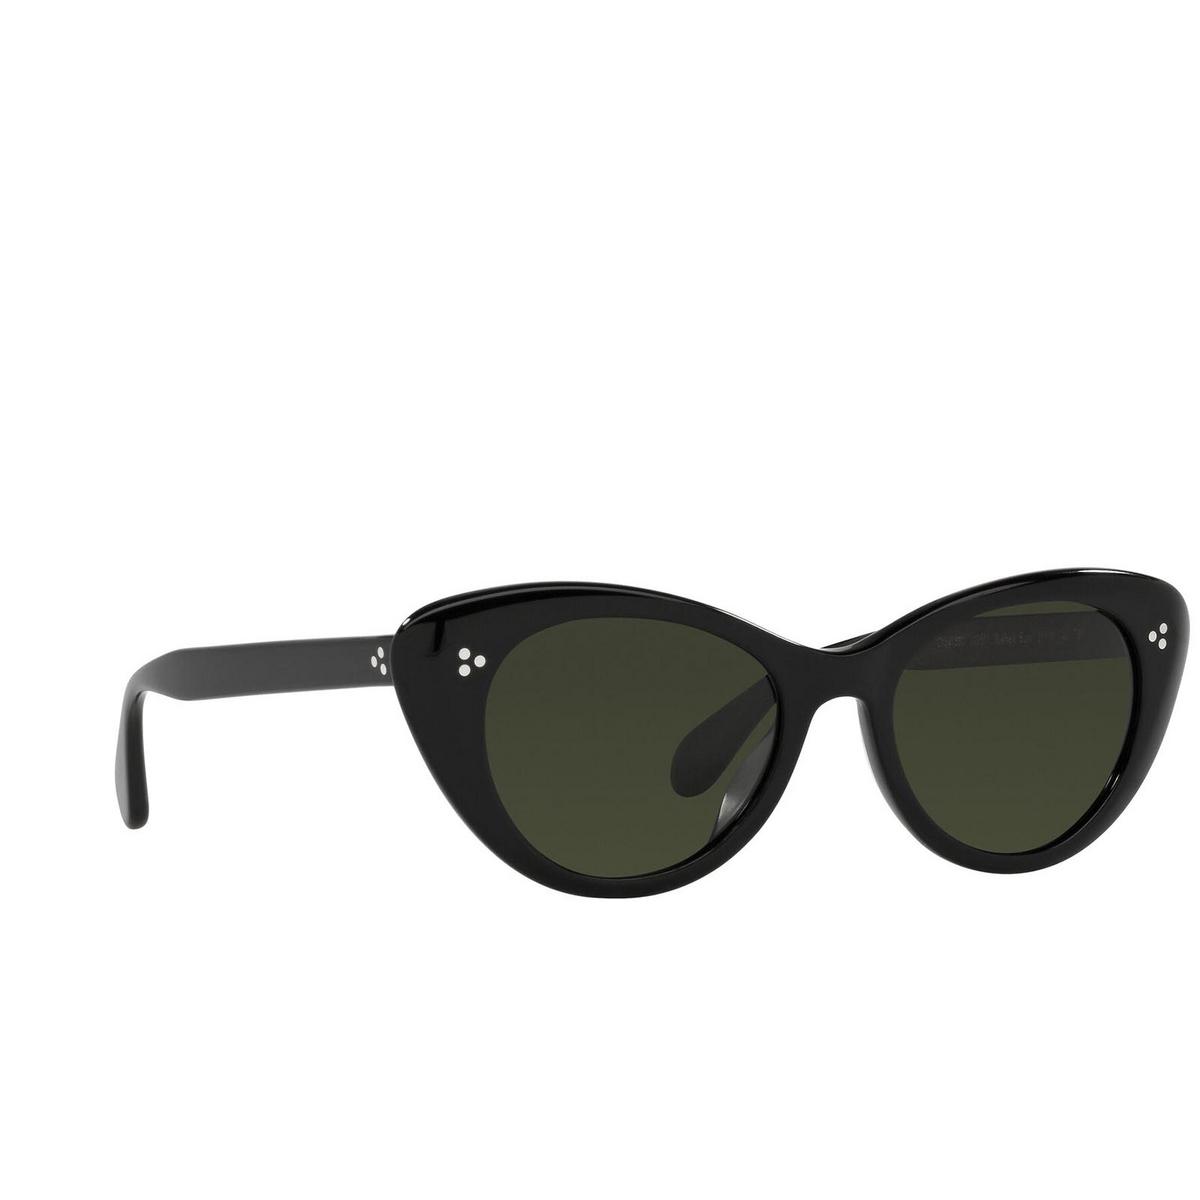 Oliver Peoples® Butterfly Sunglasses: Rishell Sun OV5415SU color Black 1005P1 - three-quarters view.